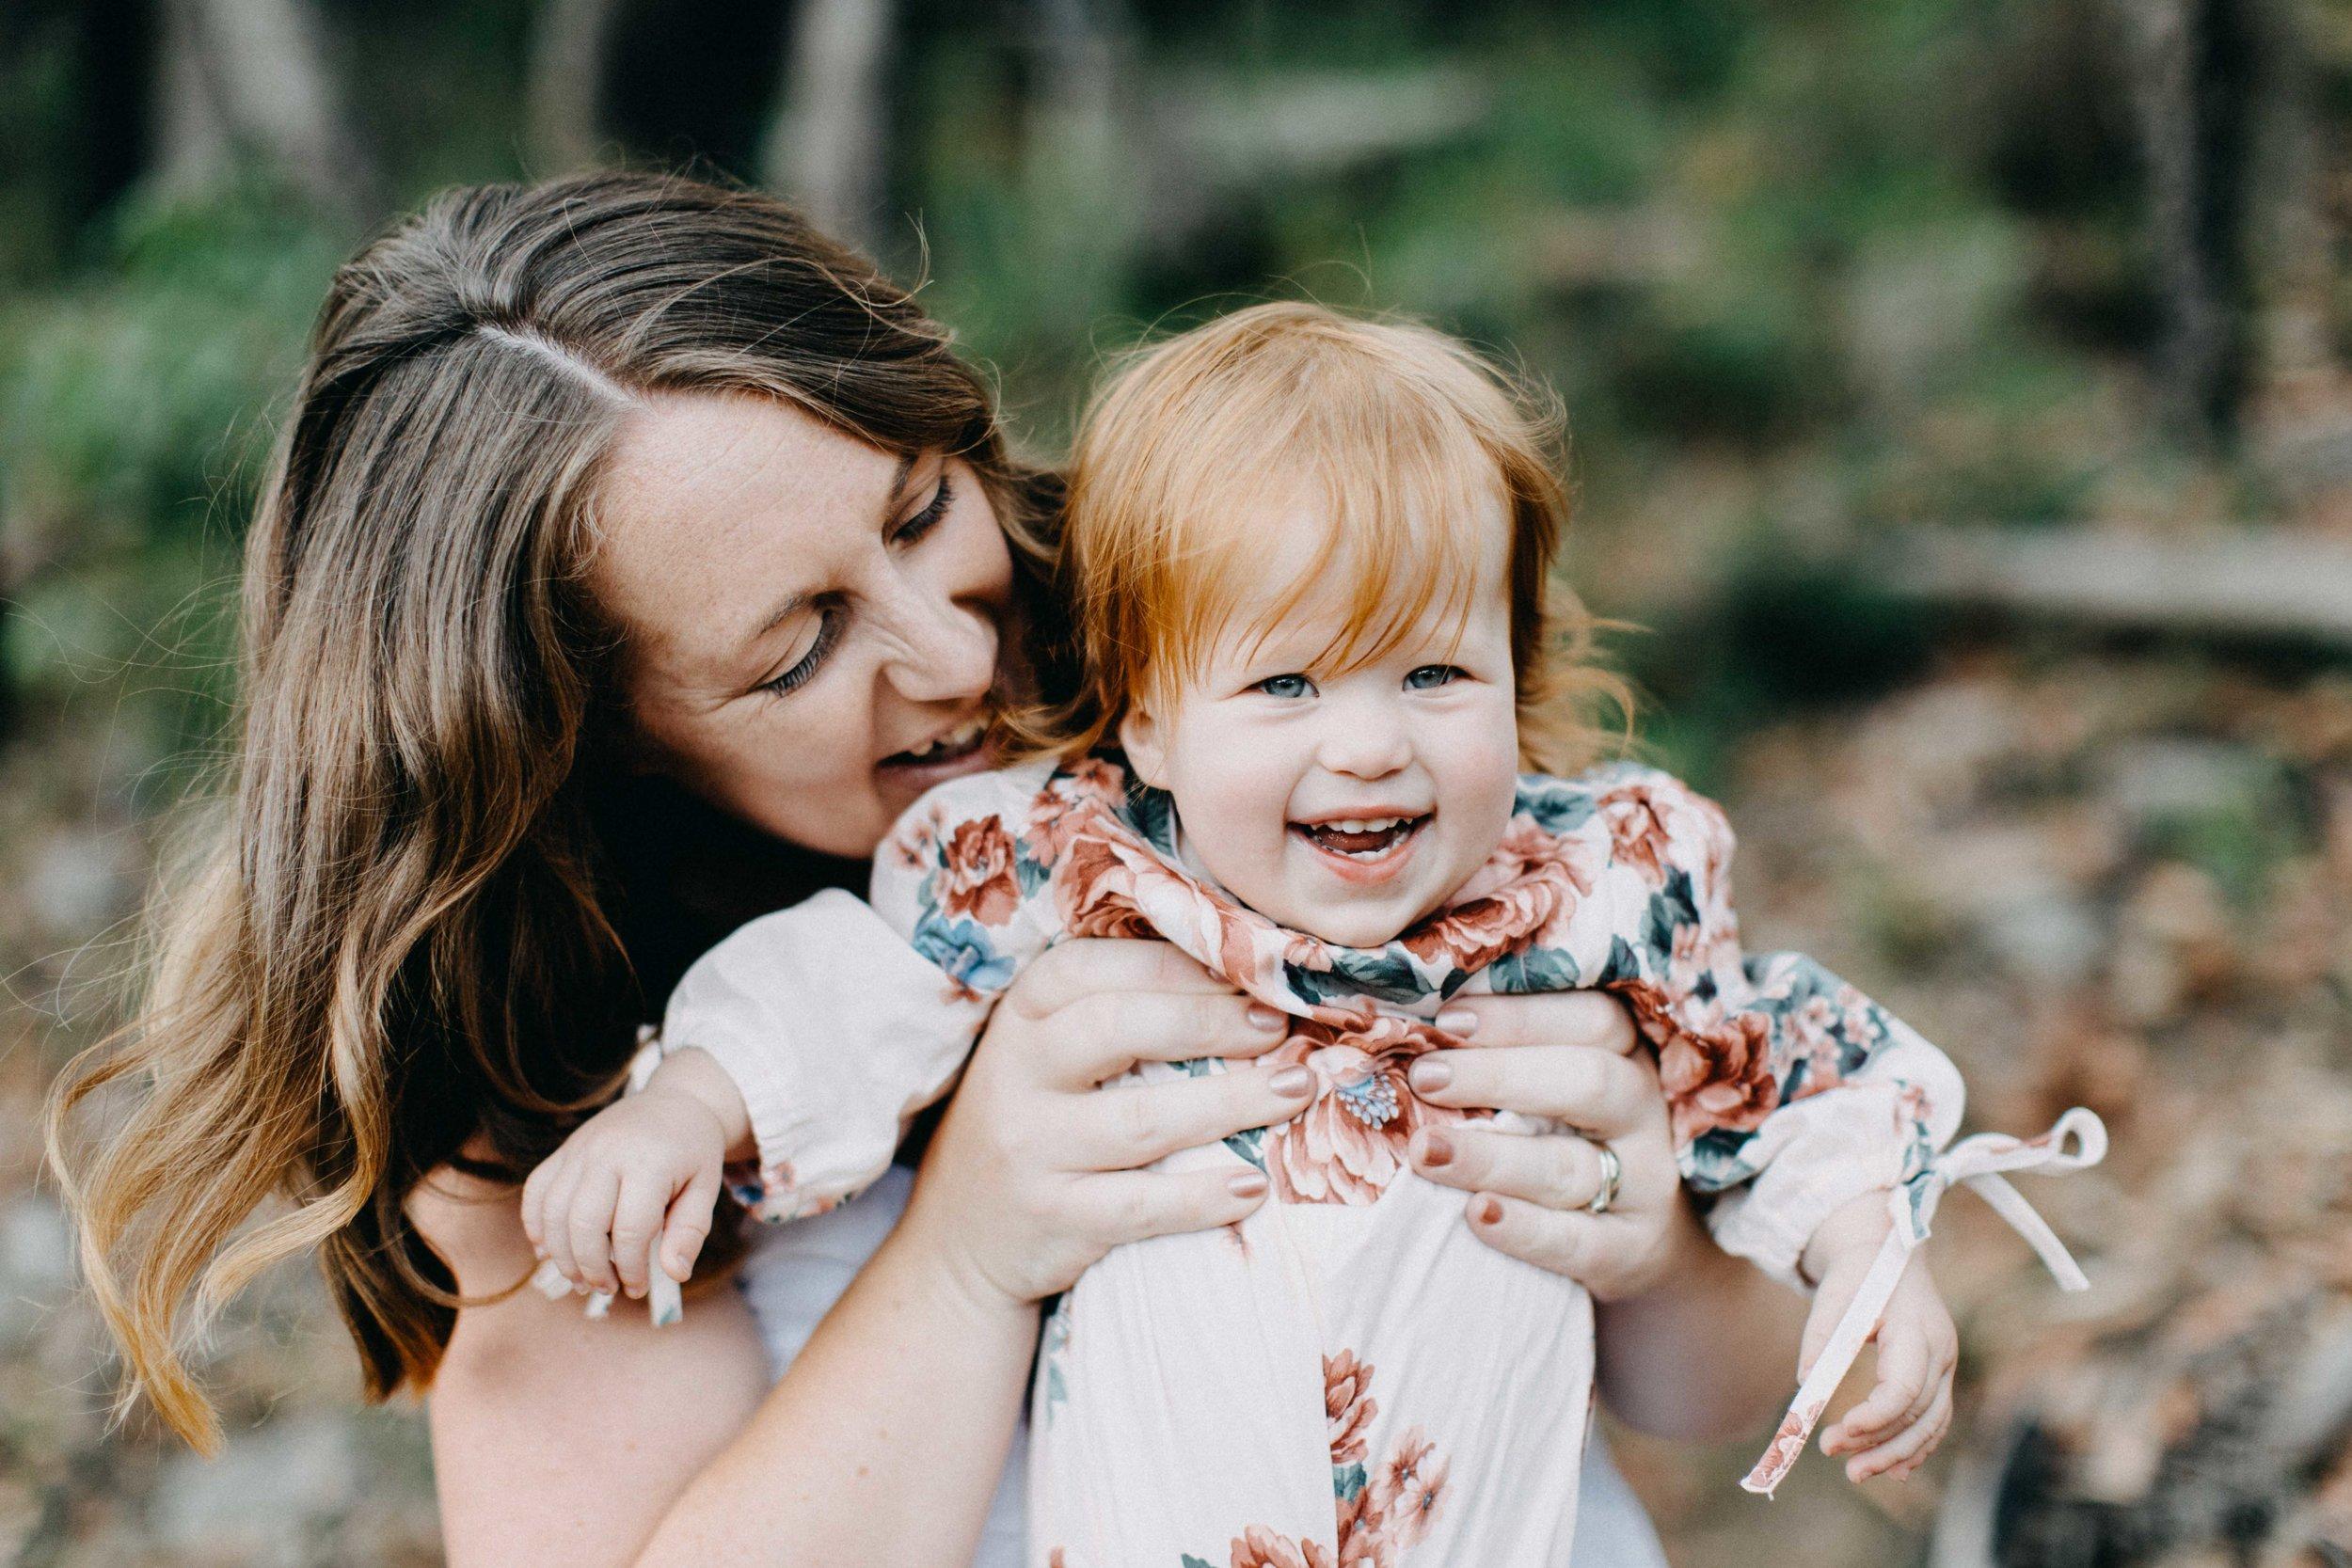 southern-highlands-maternity-photography-macarthur-ruth-www.emilyobrienphotography.net-17.jpg